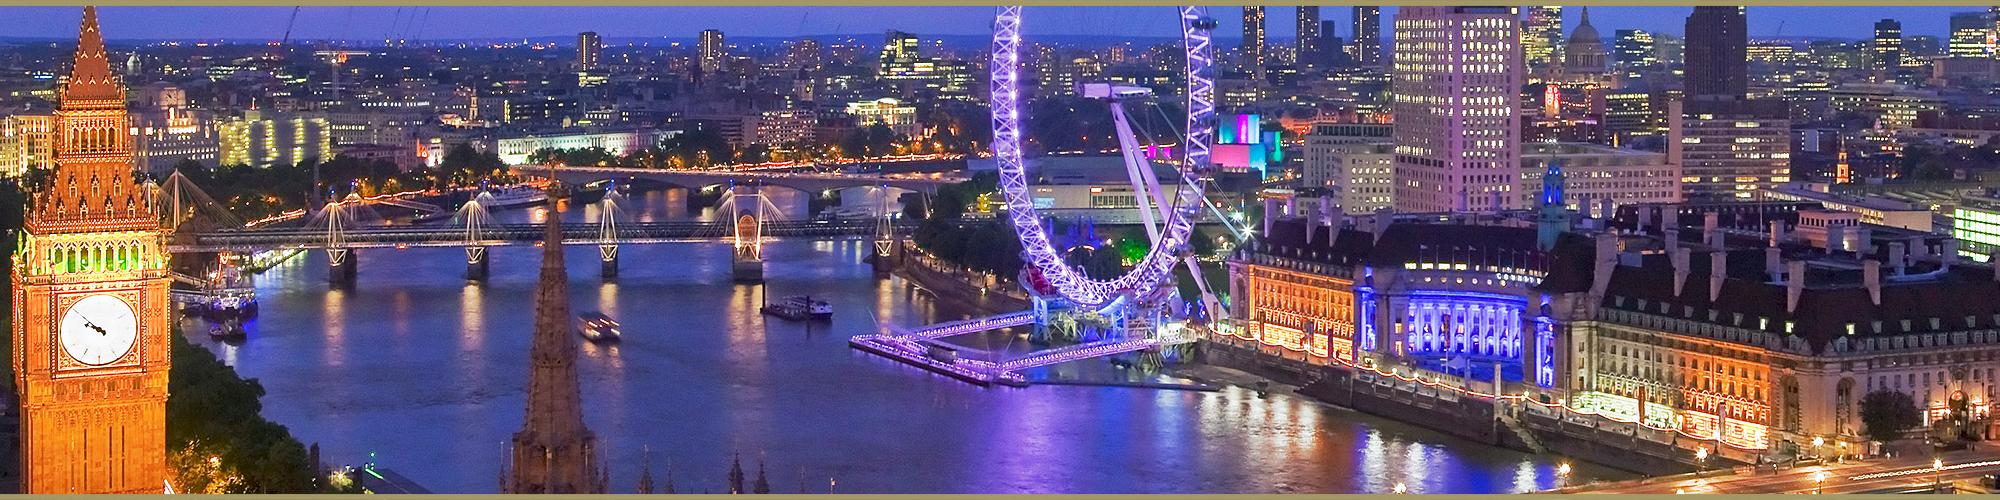 copy-london-pana.jpg